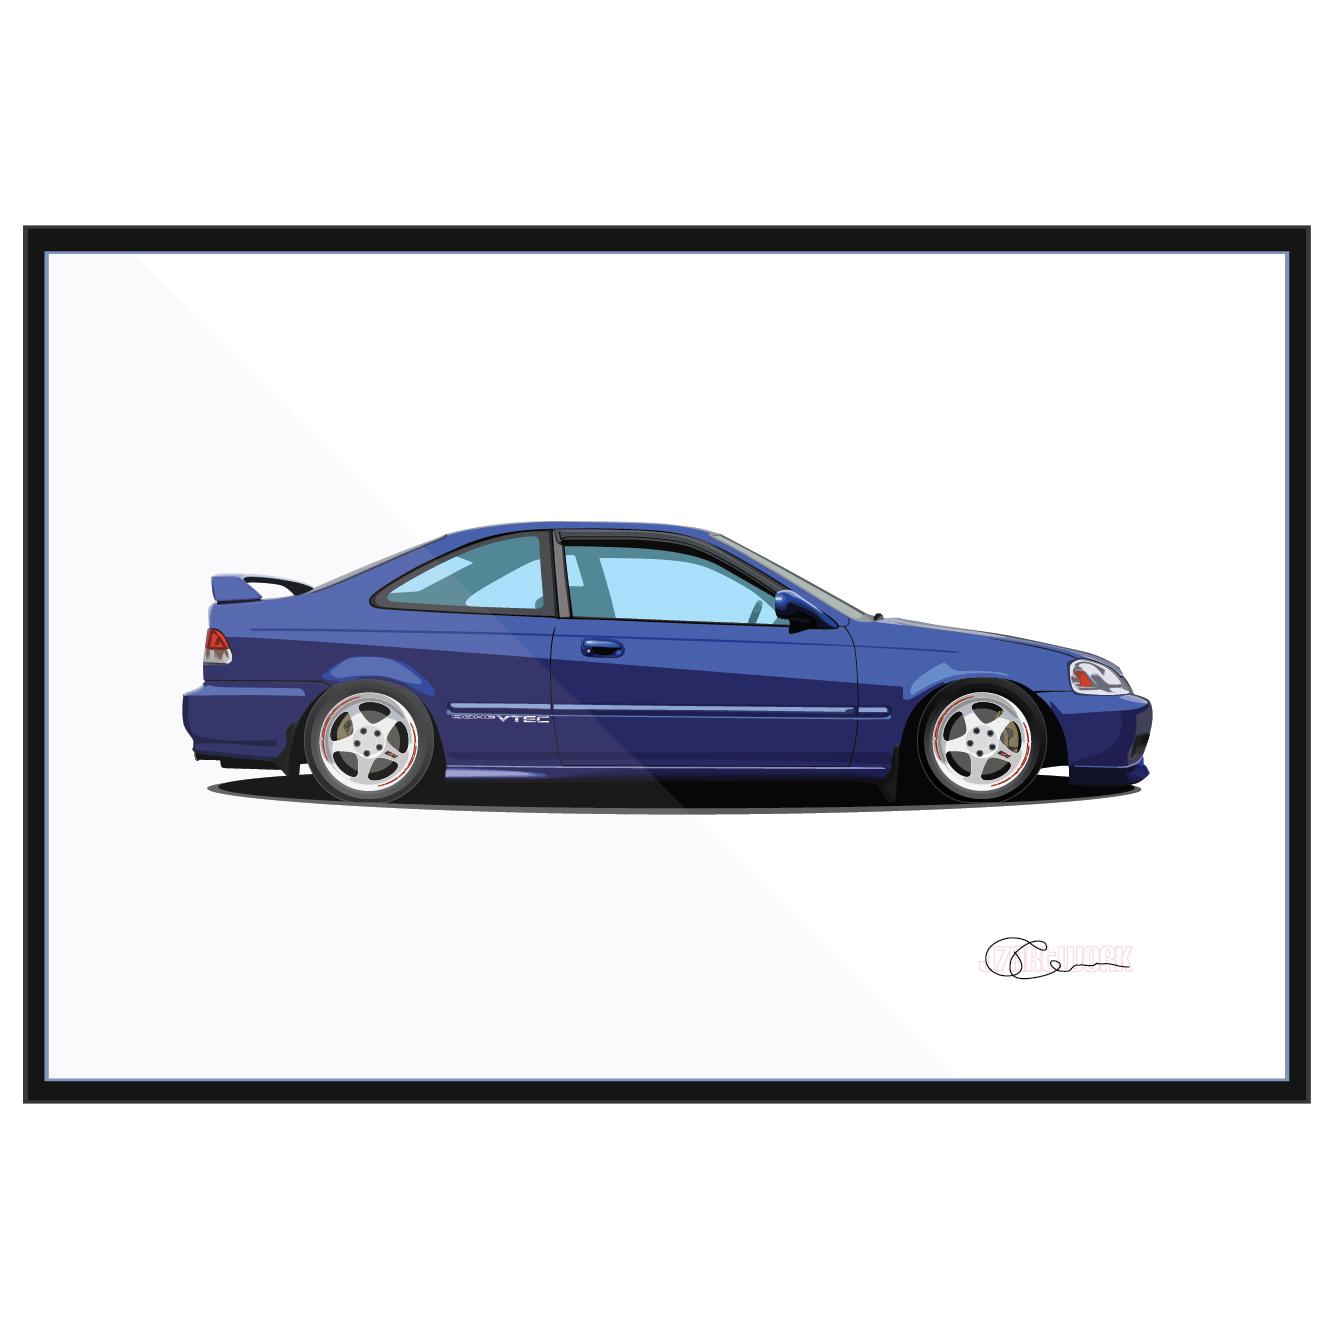 Captivating 1999 Honda Civic Si Print